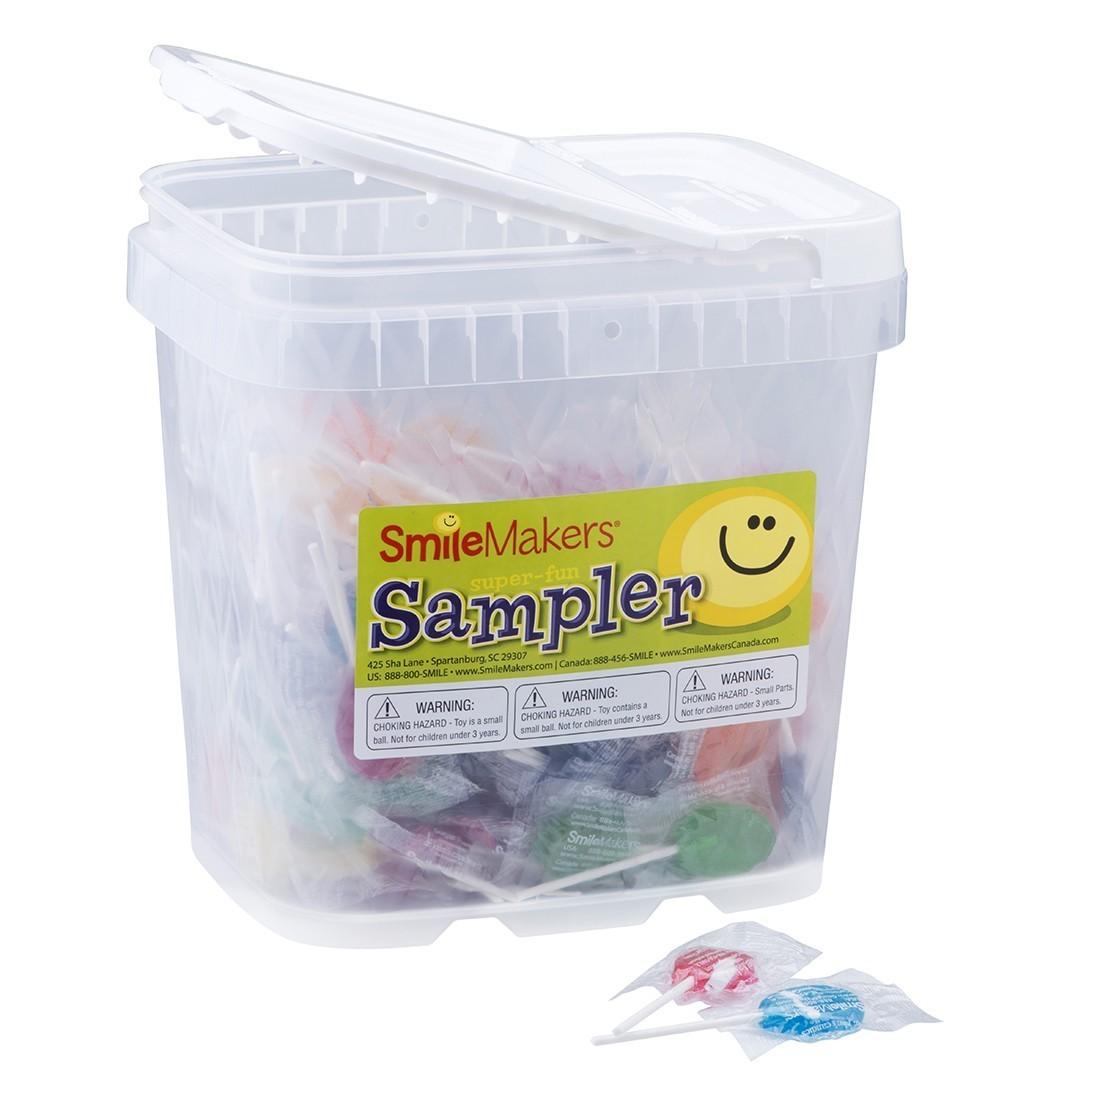 Dr. John's® Sugar Free Lollipop Sampler [image]